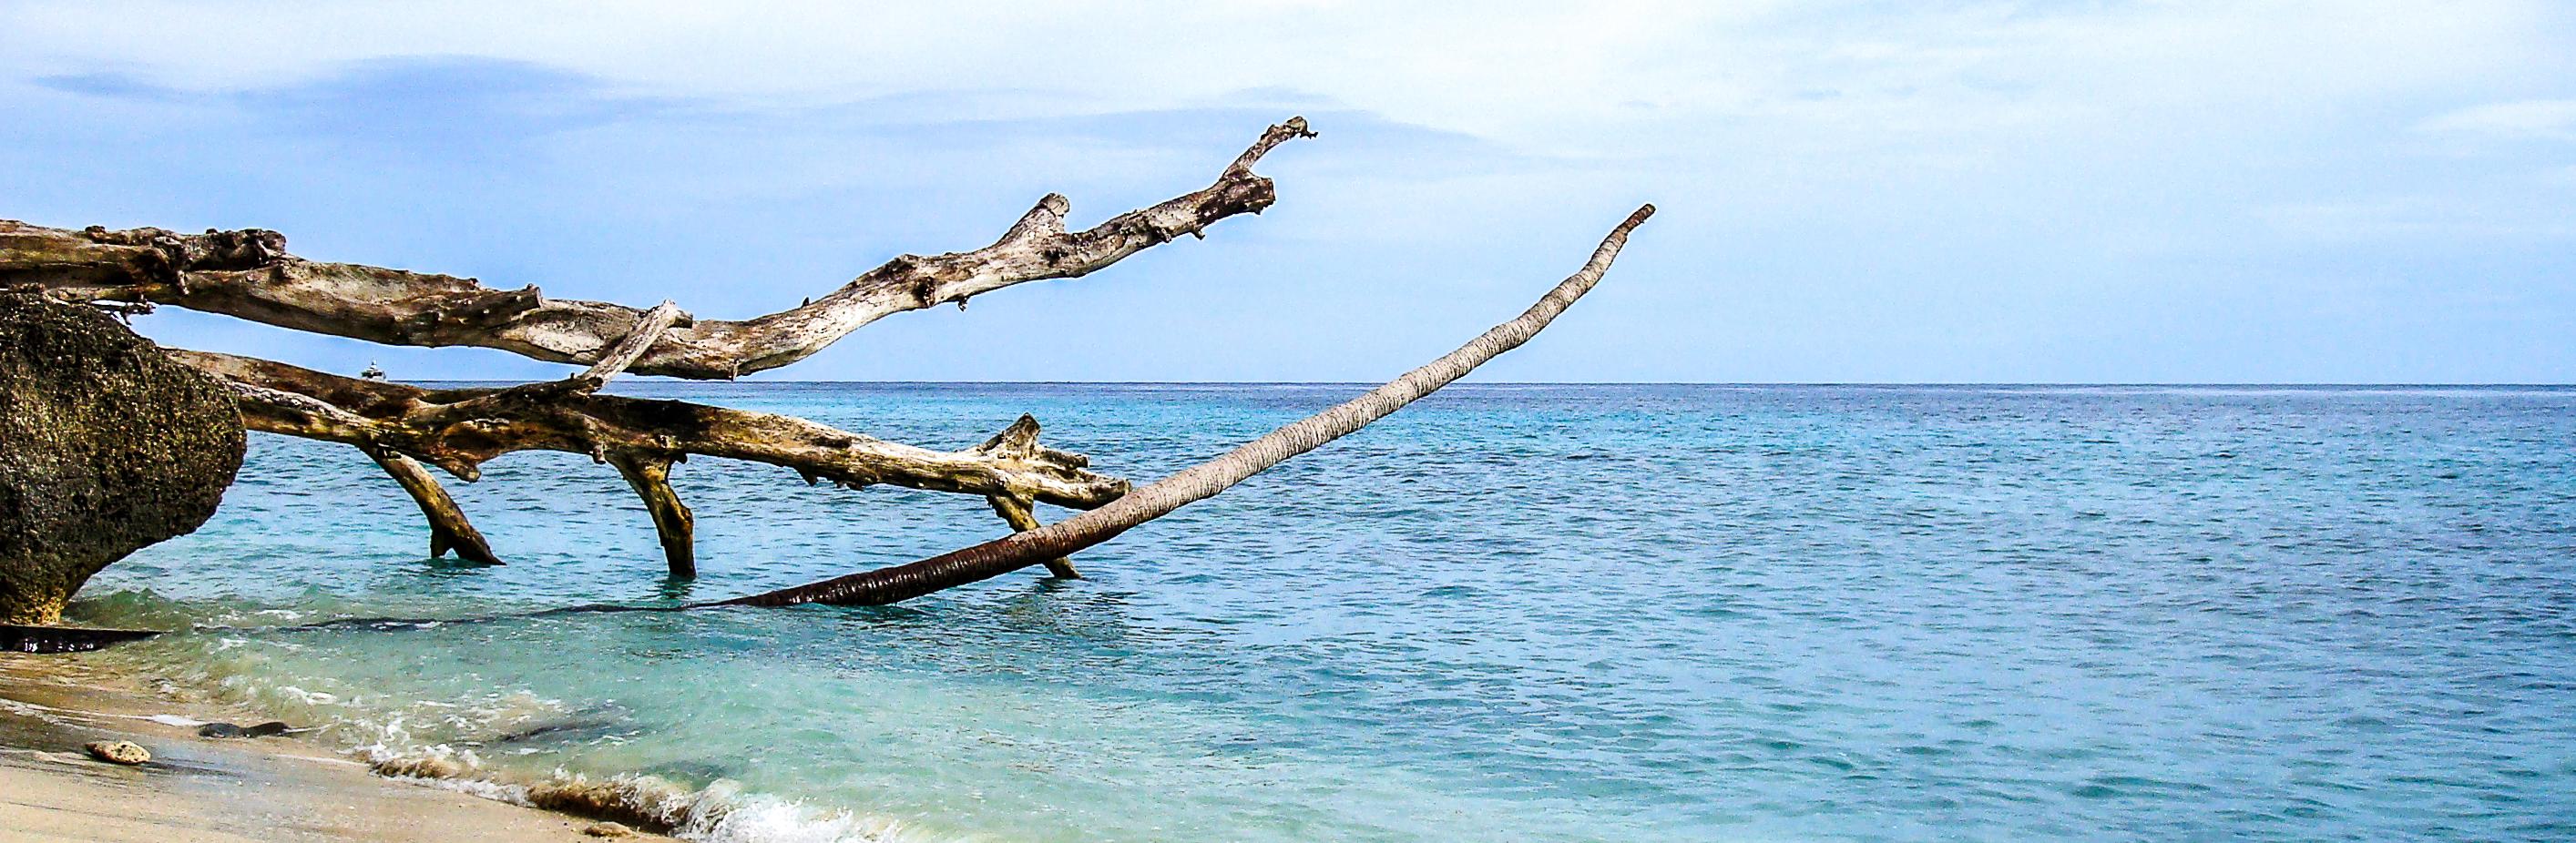 Pulau Weh-7